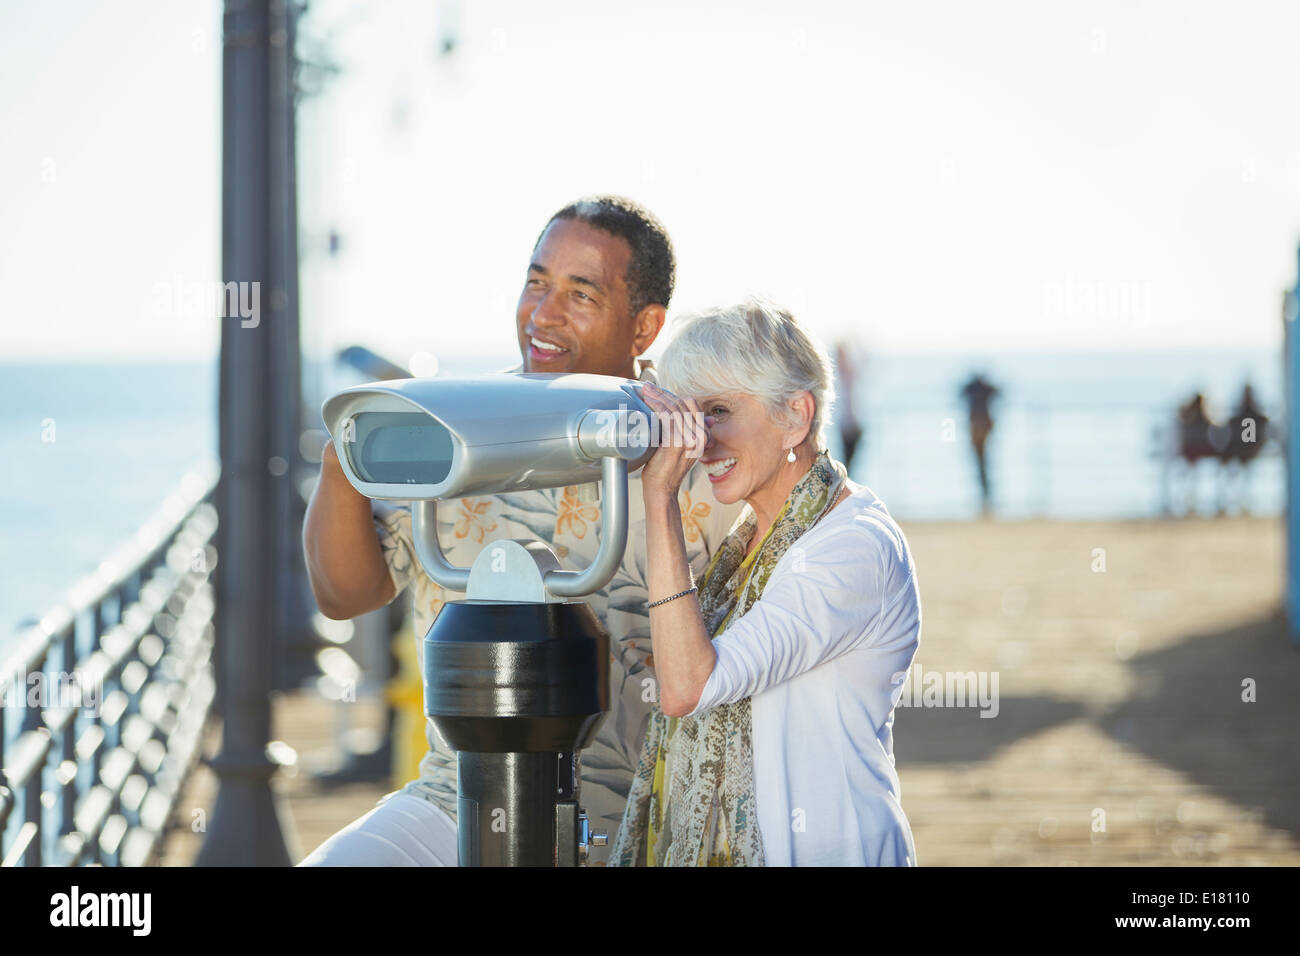 Senior couple using coin-operated binoculars on pier - Stock Image